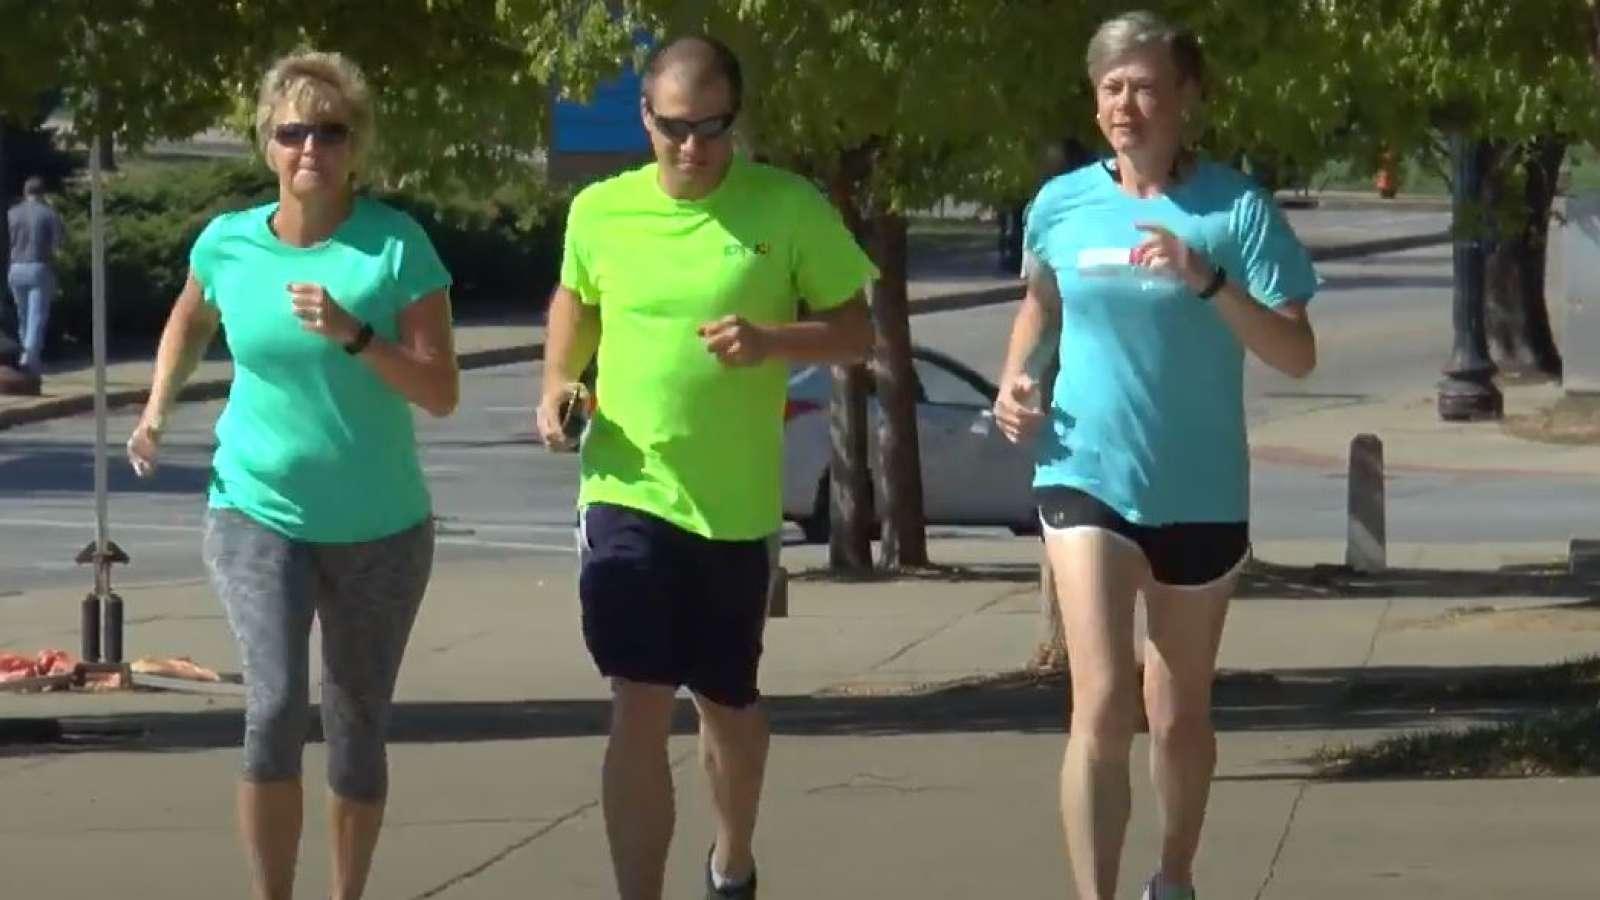 three people jogging down a sidewalk